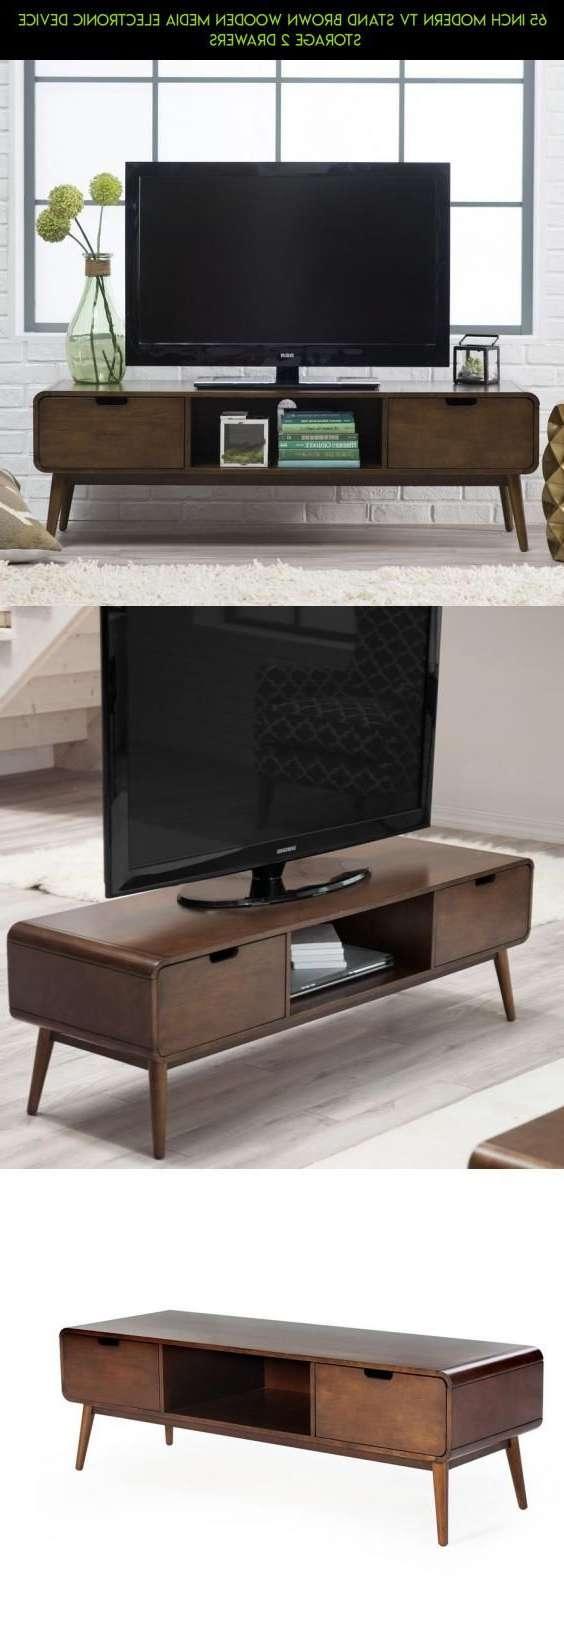 Tv : All Modern Tv Stands 2 Stylish Modern Tv Stands 2016' Modern Inside All Modern Tv Stands (View 11 of 20)